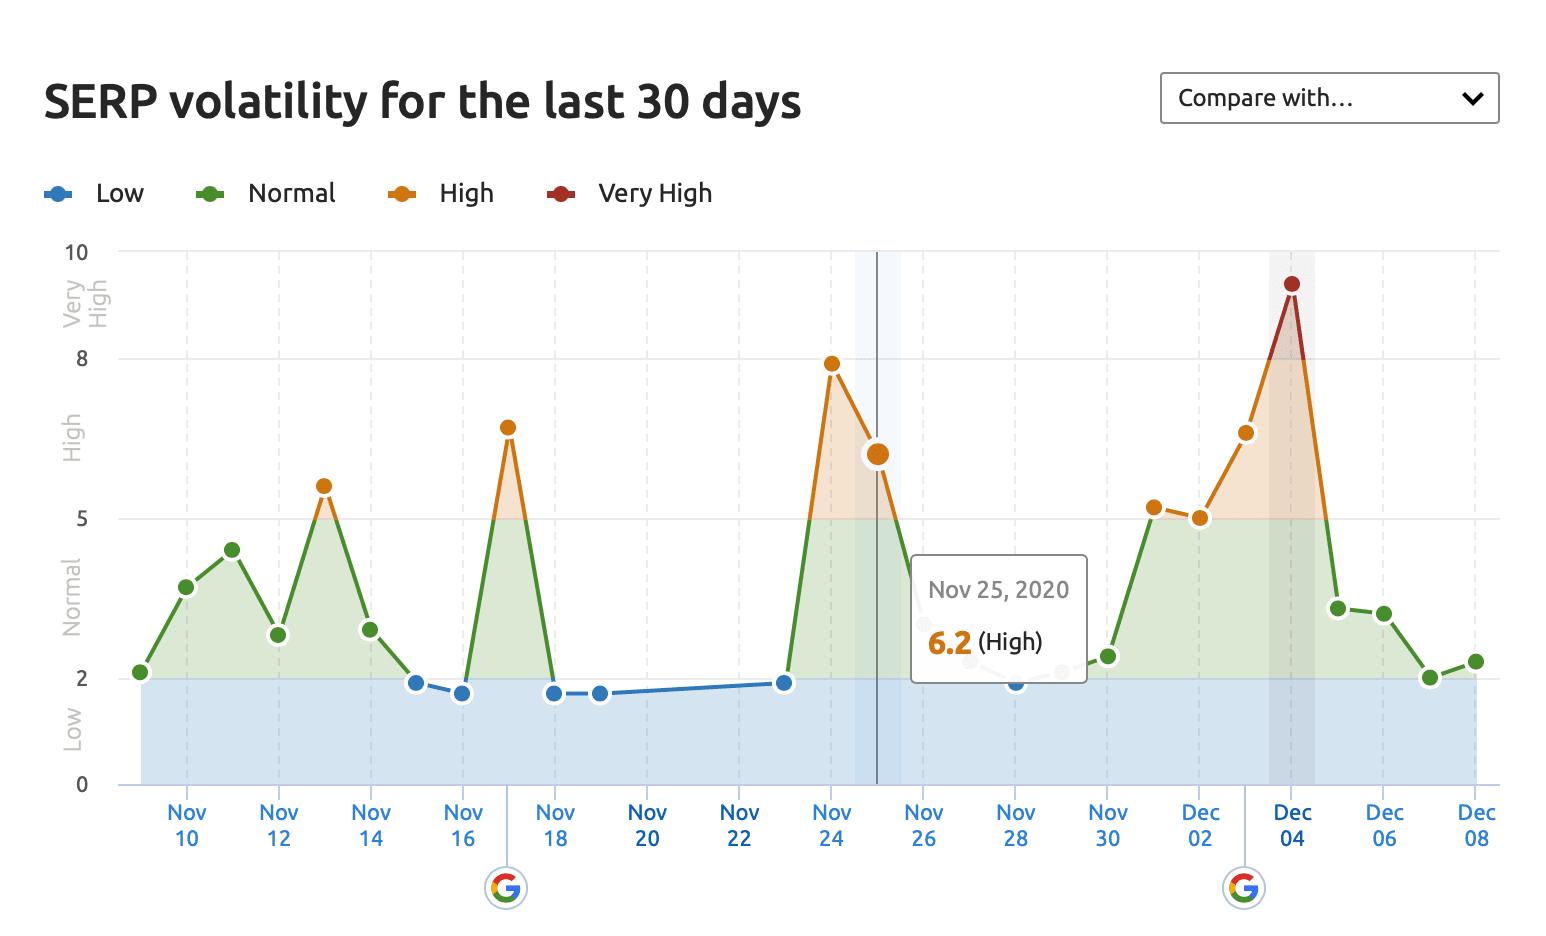 Serp volatility index 2020 December